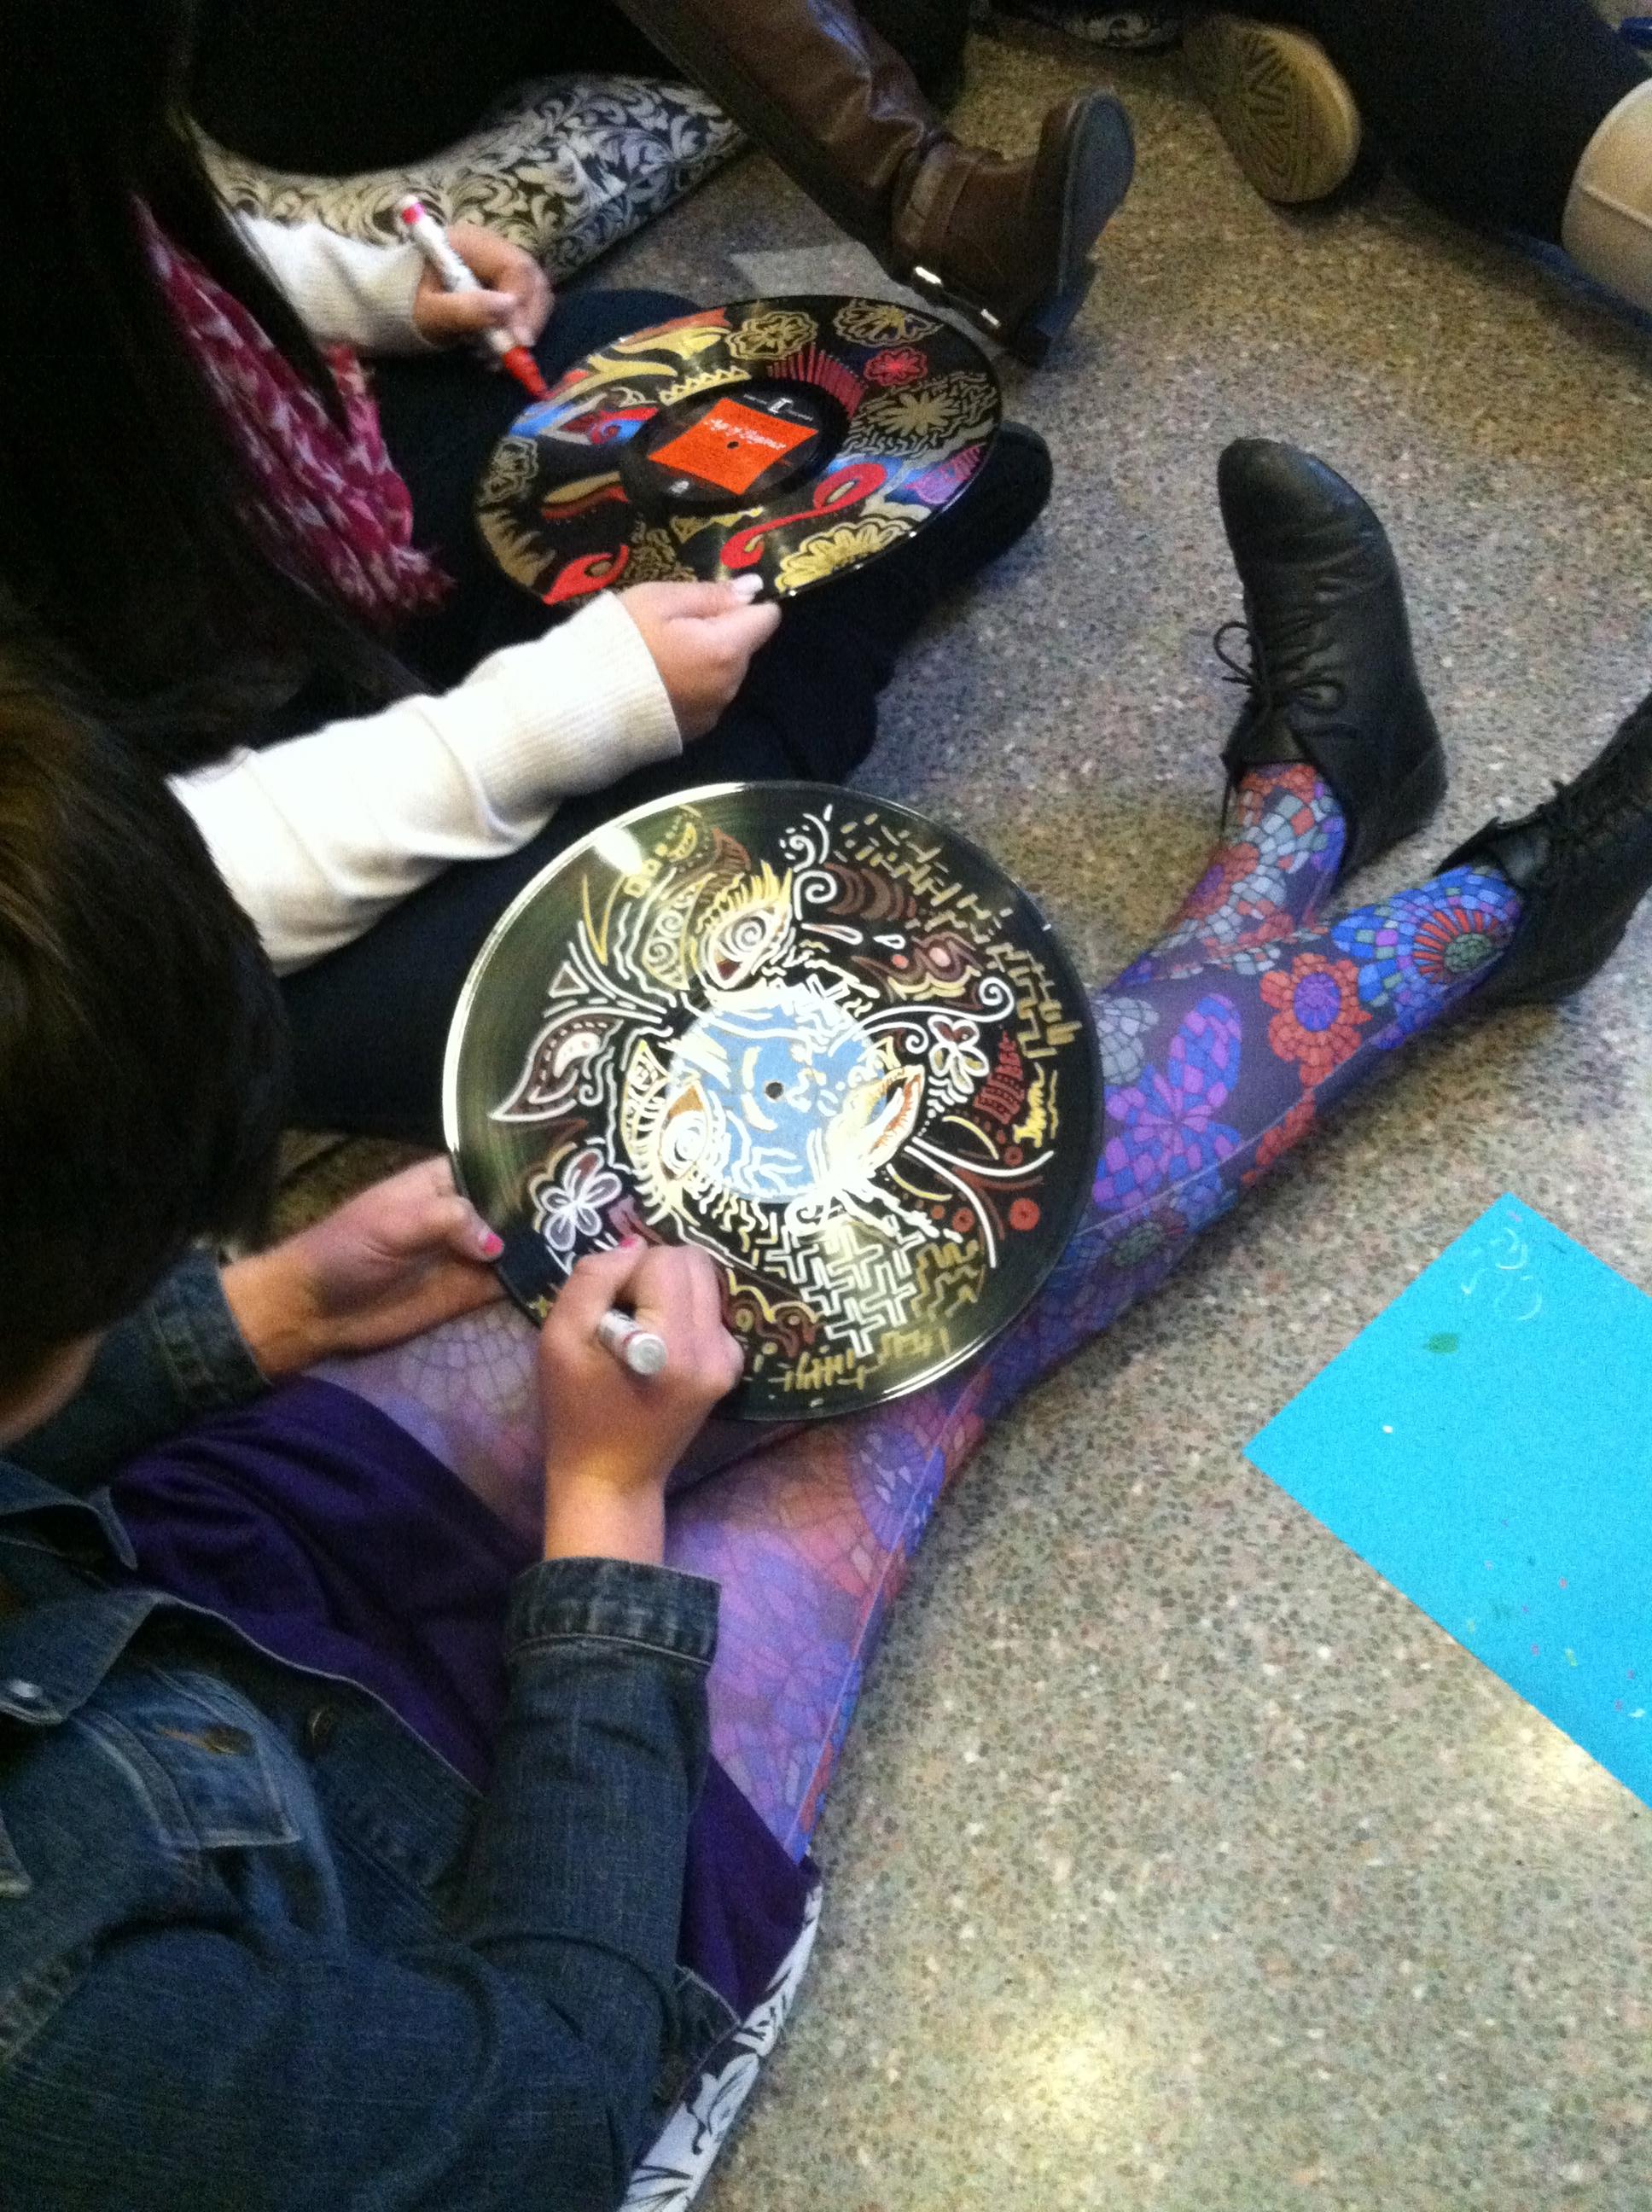 Teens designing patterns on vinyl